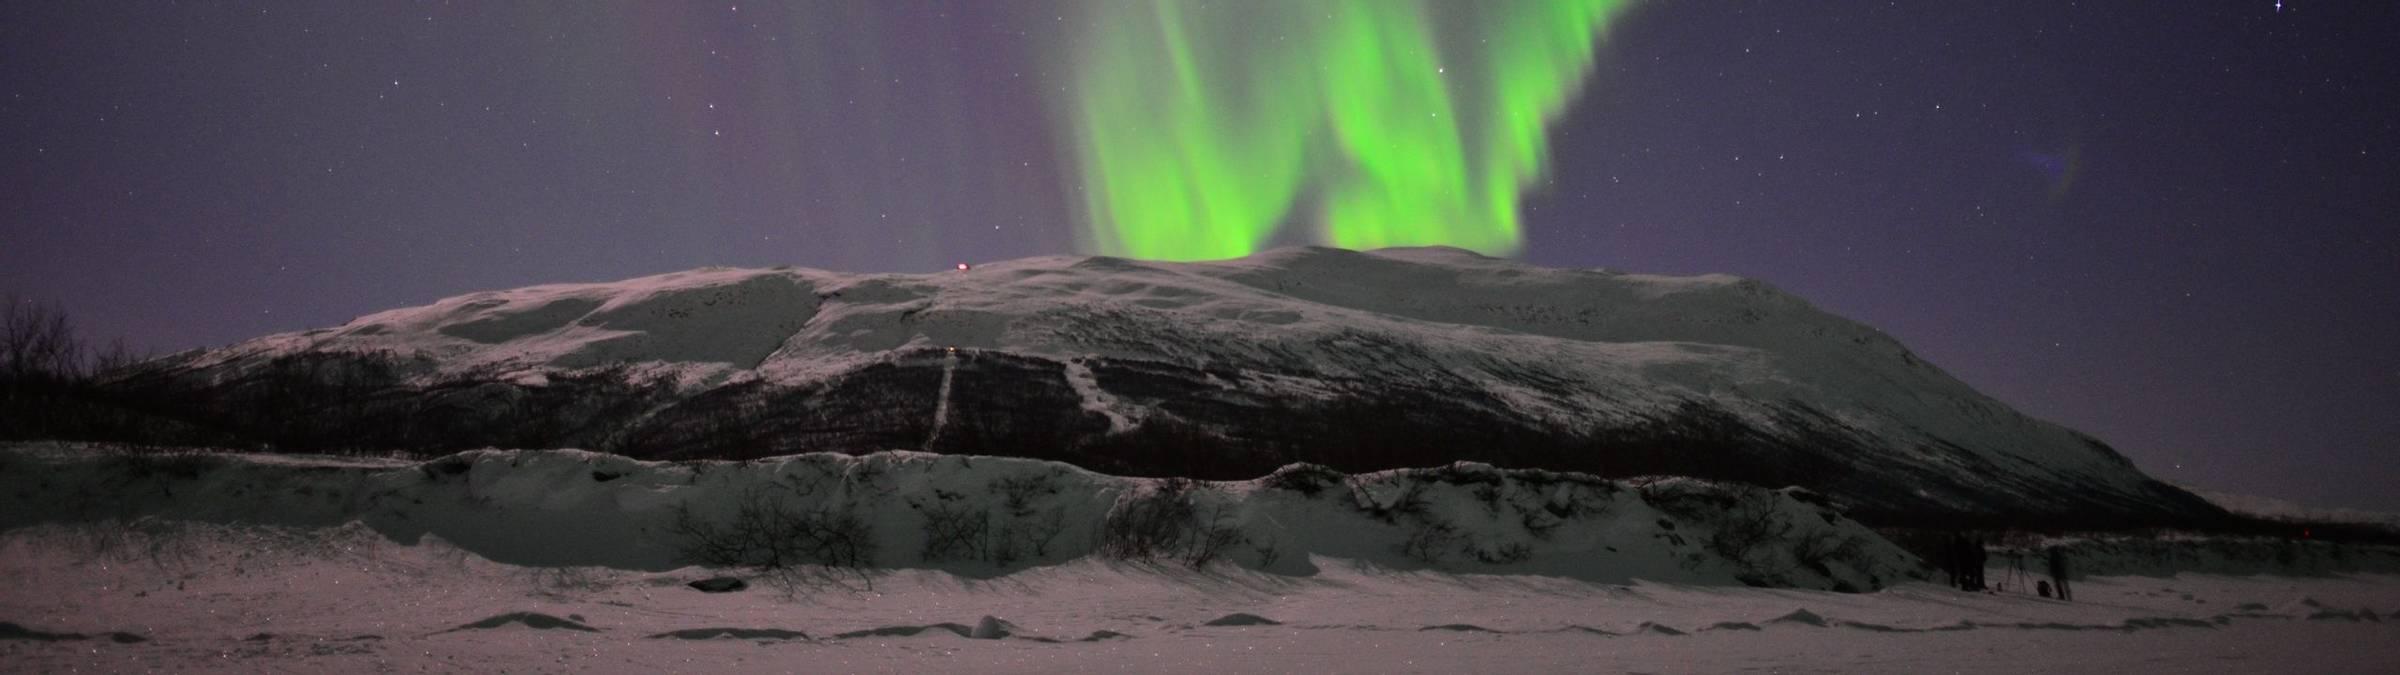 Chad Blakley - Lights Over Lapland4.JPG